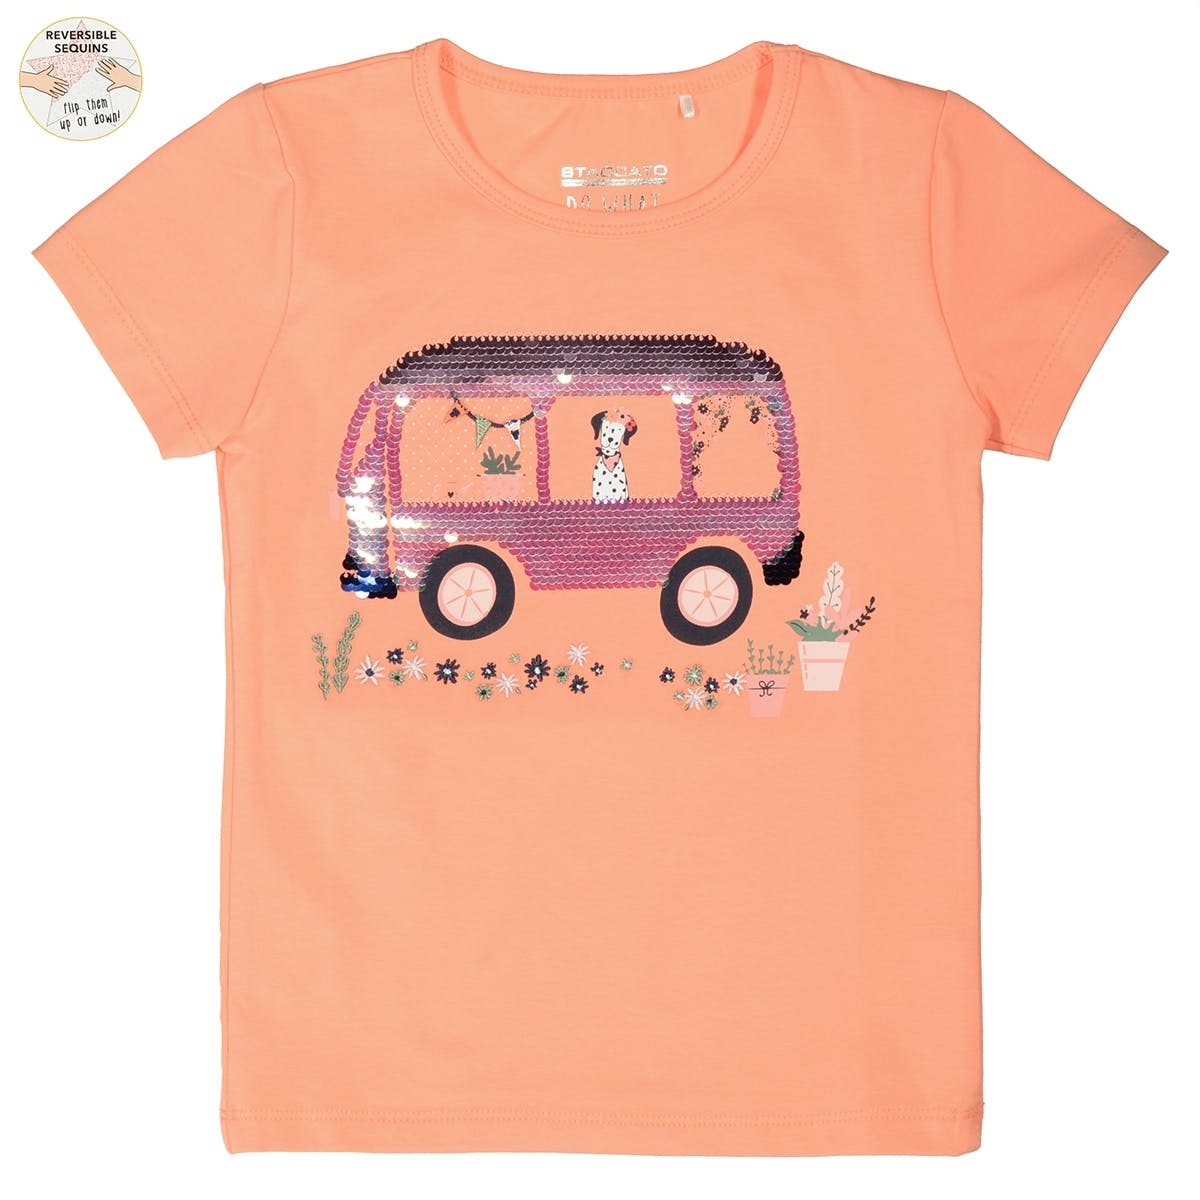 WENDEPAILLETTEN T-Shirt - Light Orange